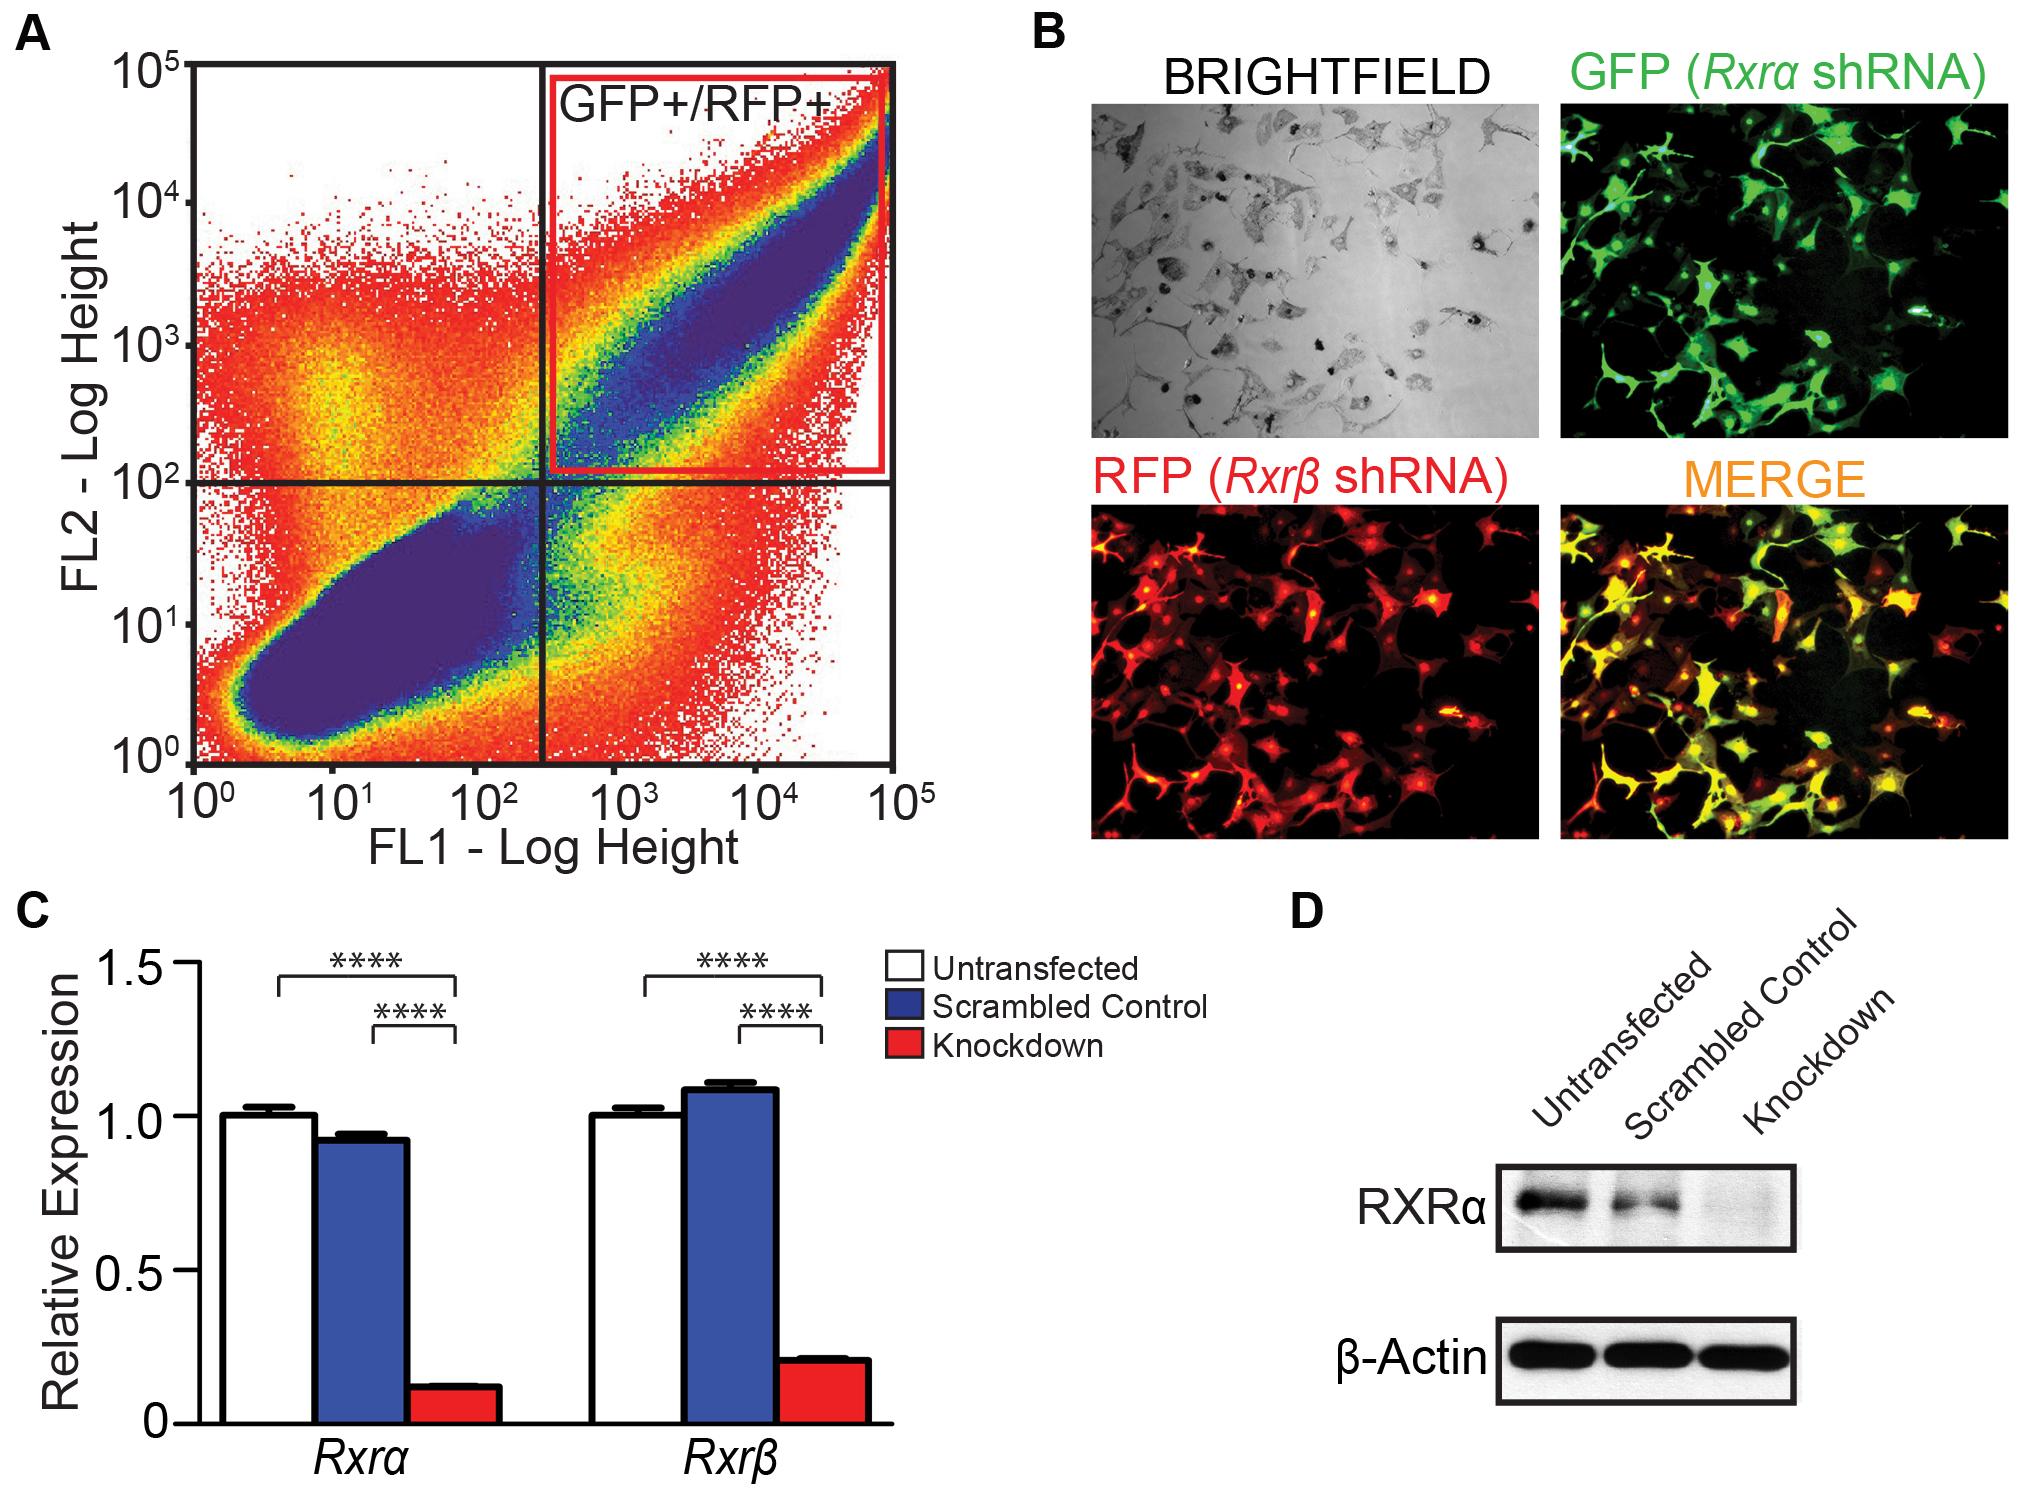 Generation of <i>Rxrα/Rxrβ</i> double knockdown murine melanocytes.